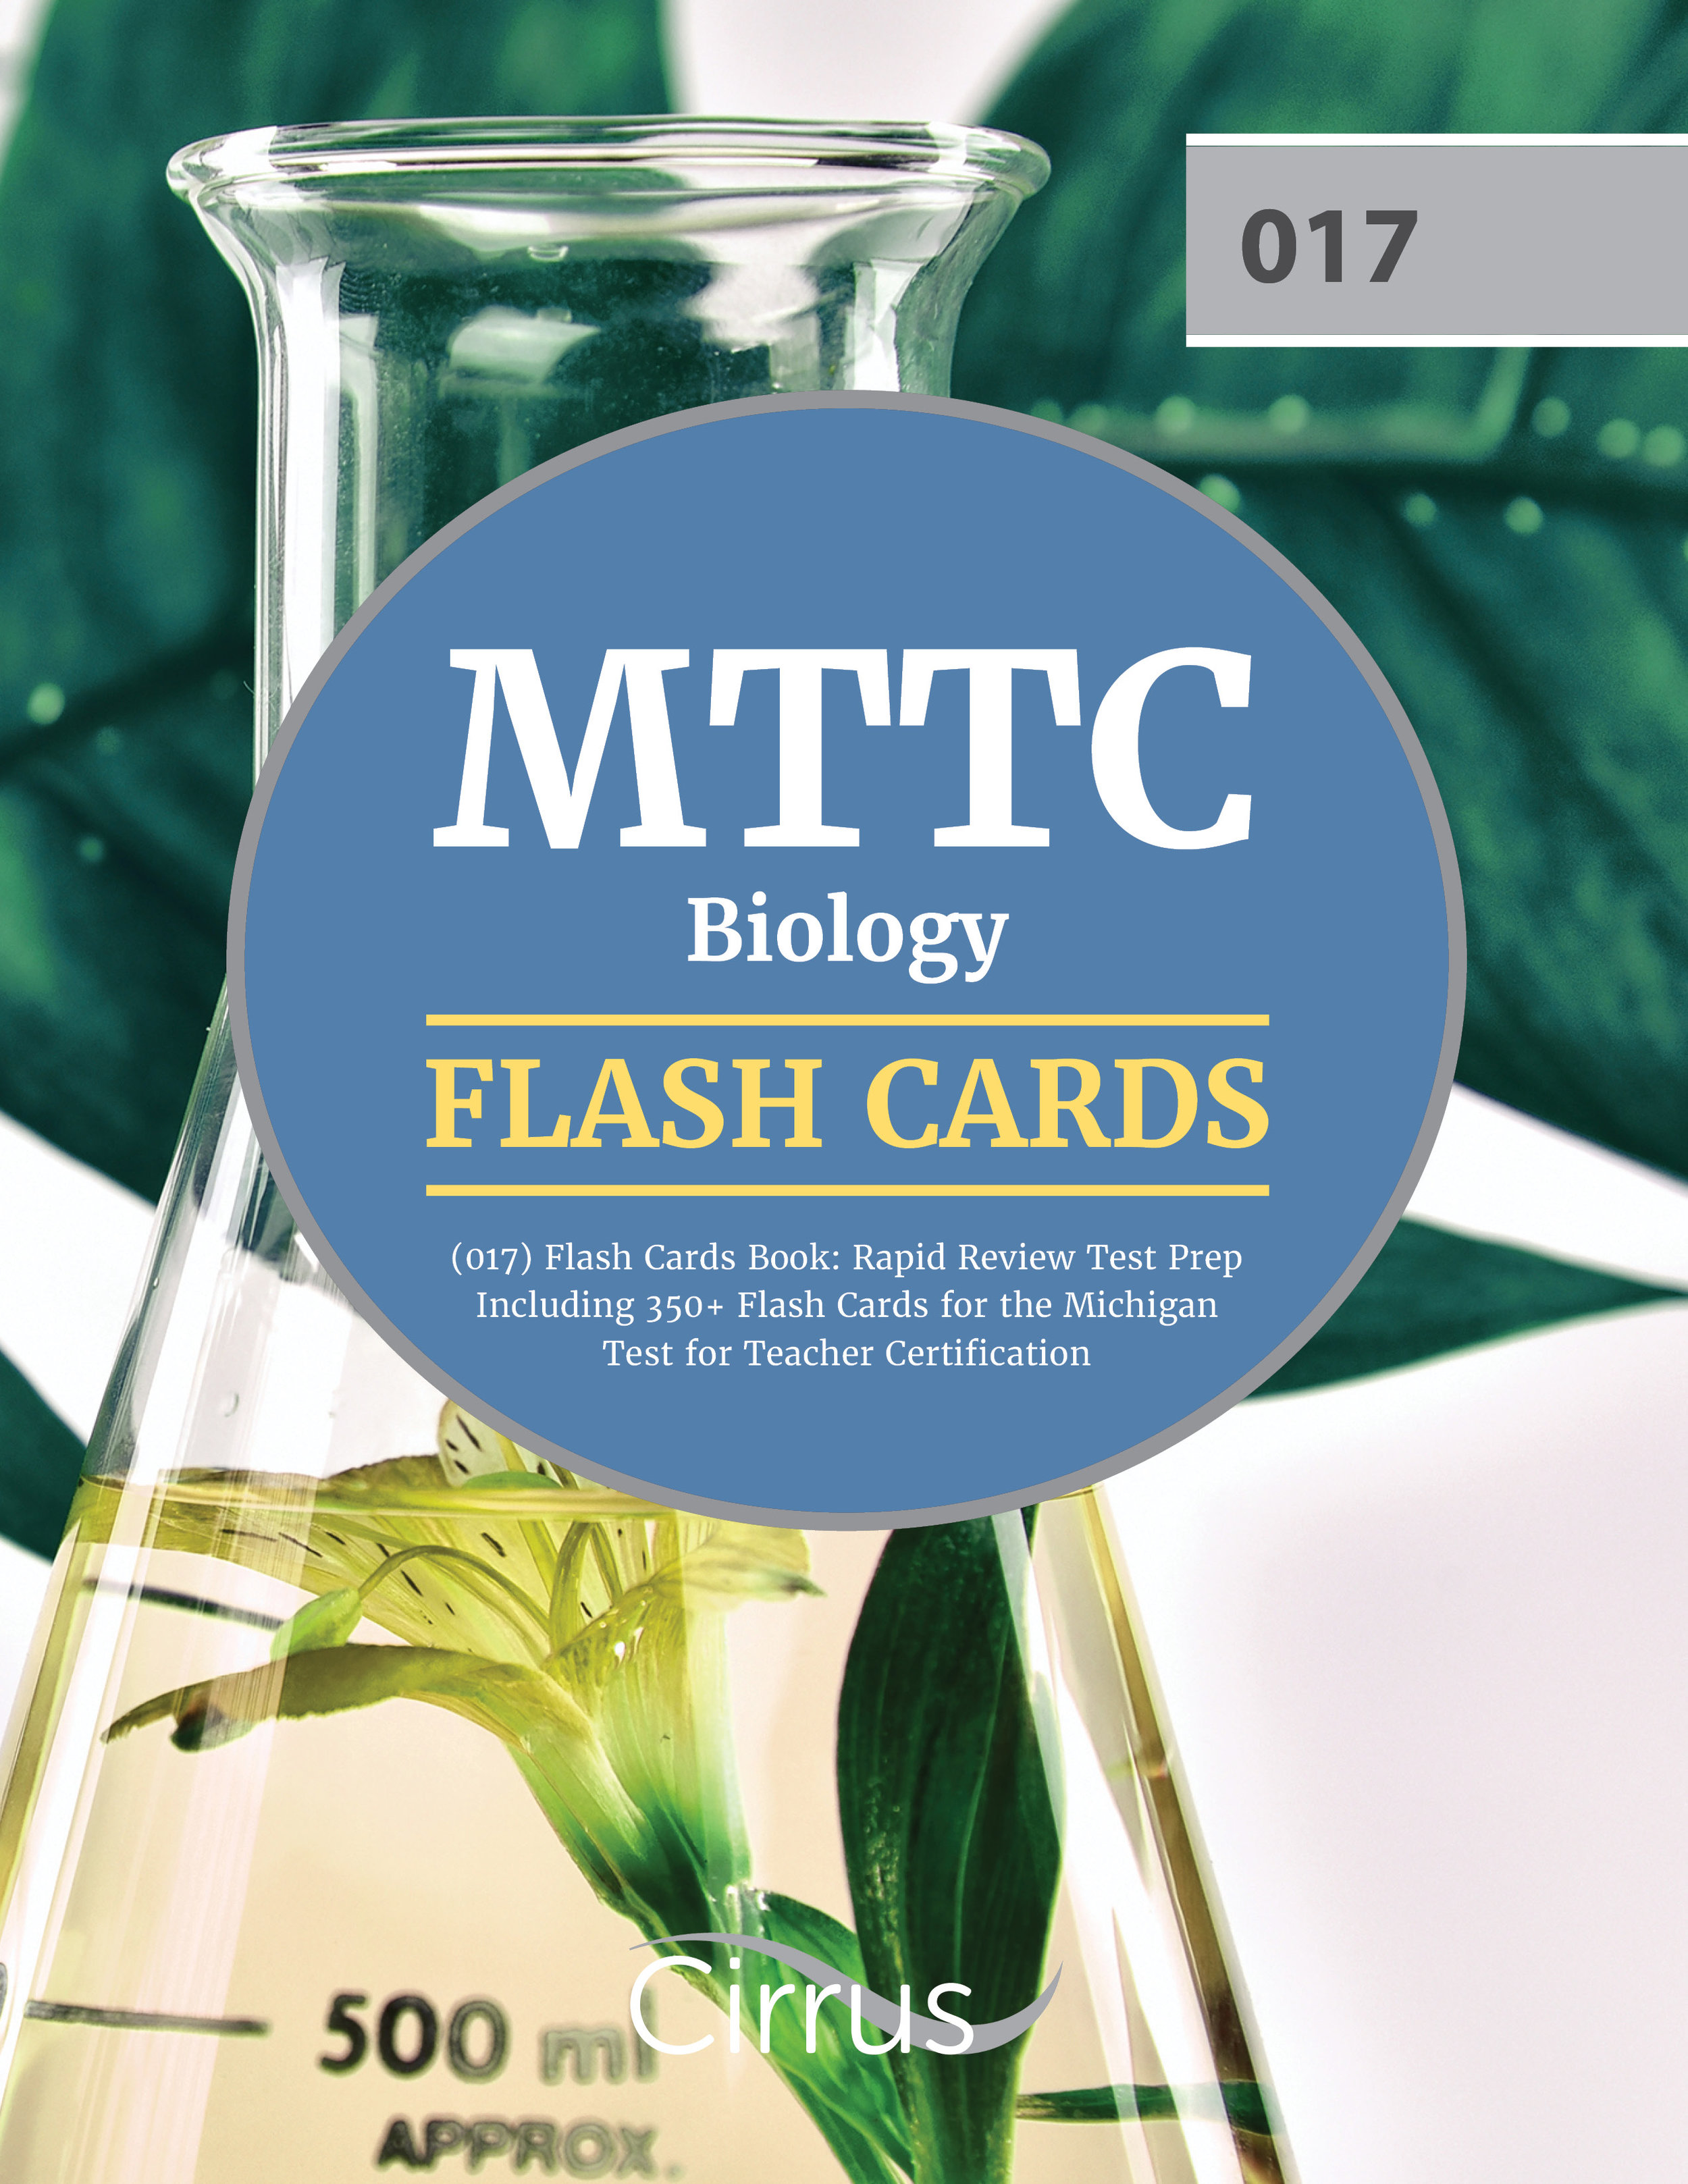 MTTC_Bio_FC_cover_website.jpg